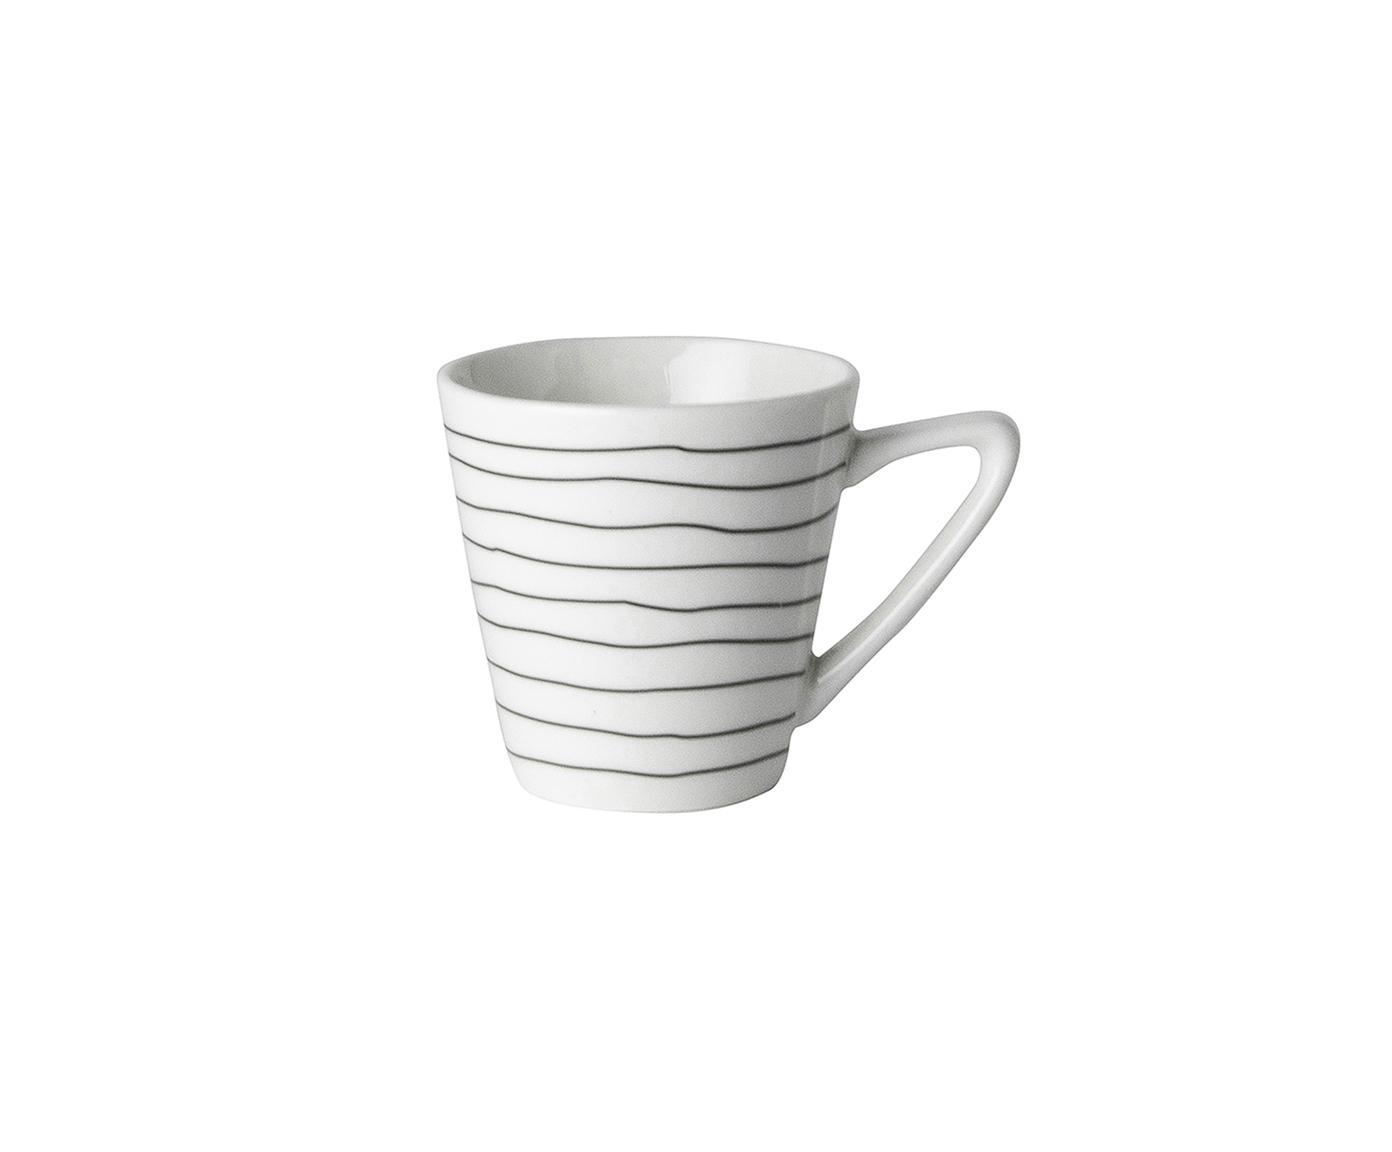 Tazas espresso Eris Loft, 4uds., Porcelana, Blanco, negro, Ø 6 x Al 6 cm